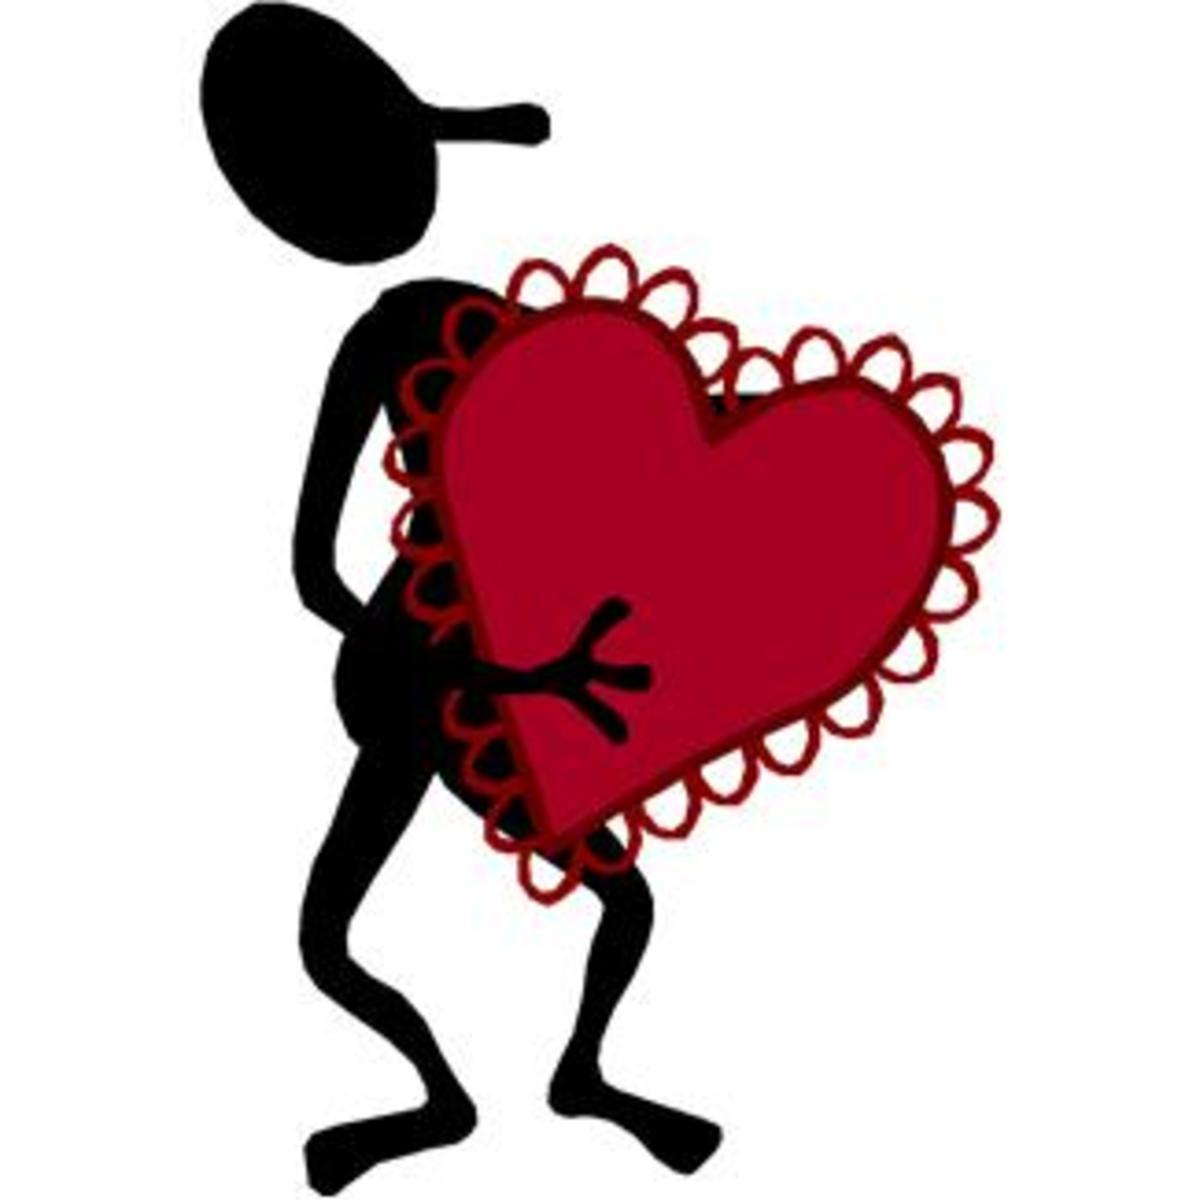 Cartoon Man holding Giant Heart